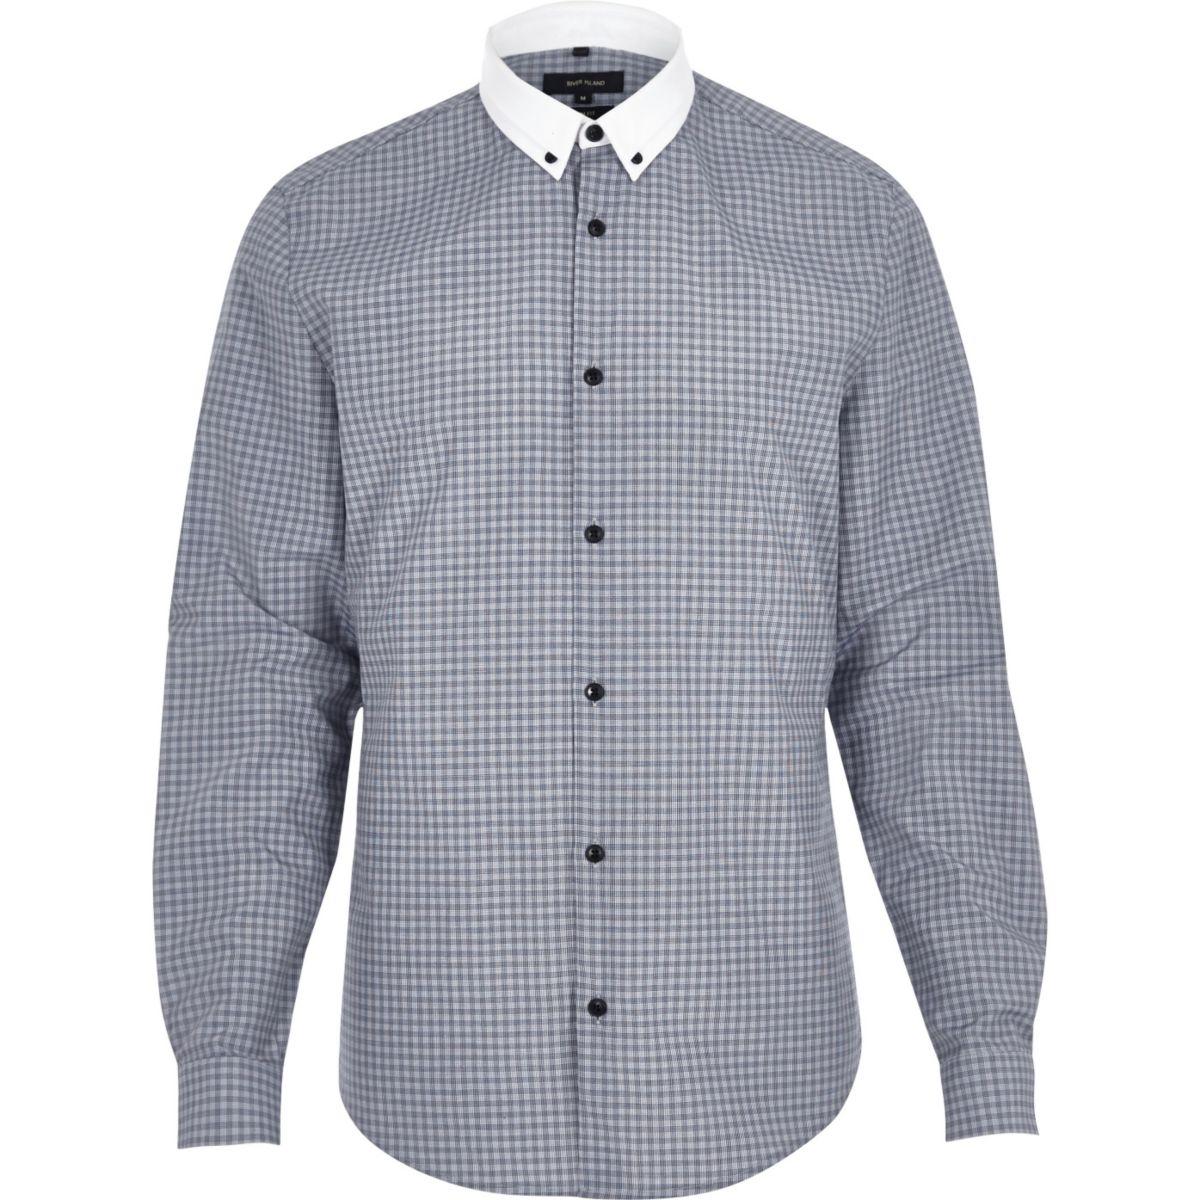 Navy smart check shirt